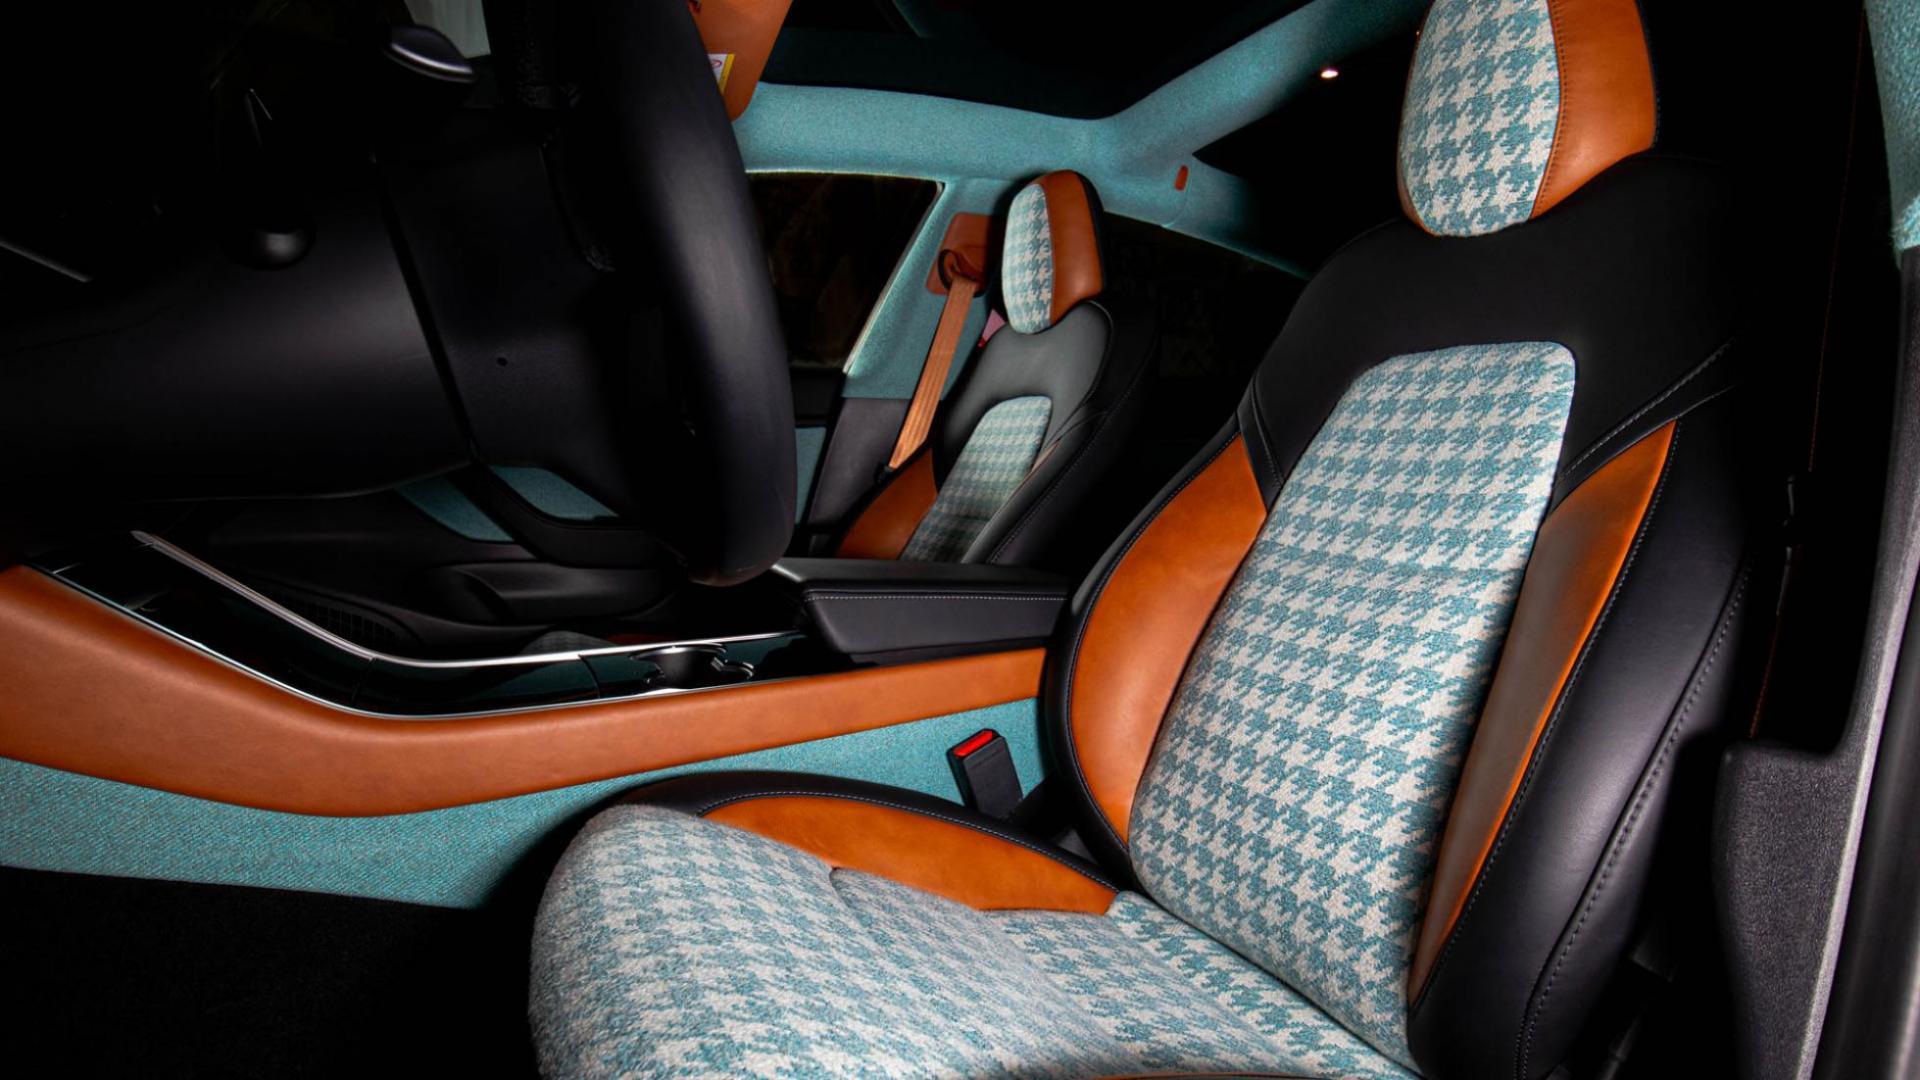 Tesla Model 3 Vilner interieur vanuit bestuurder